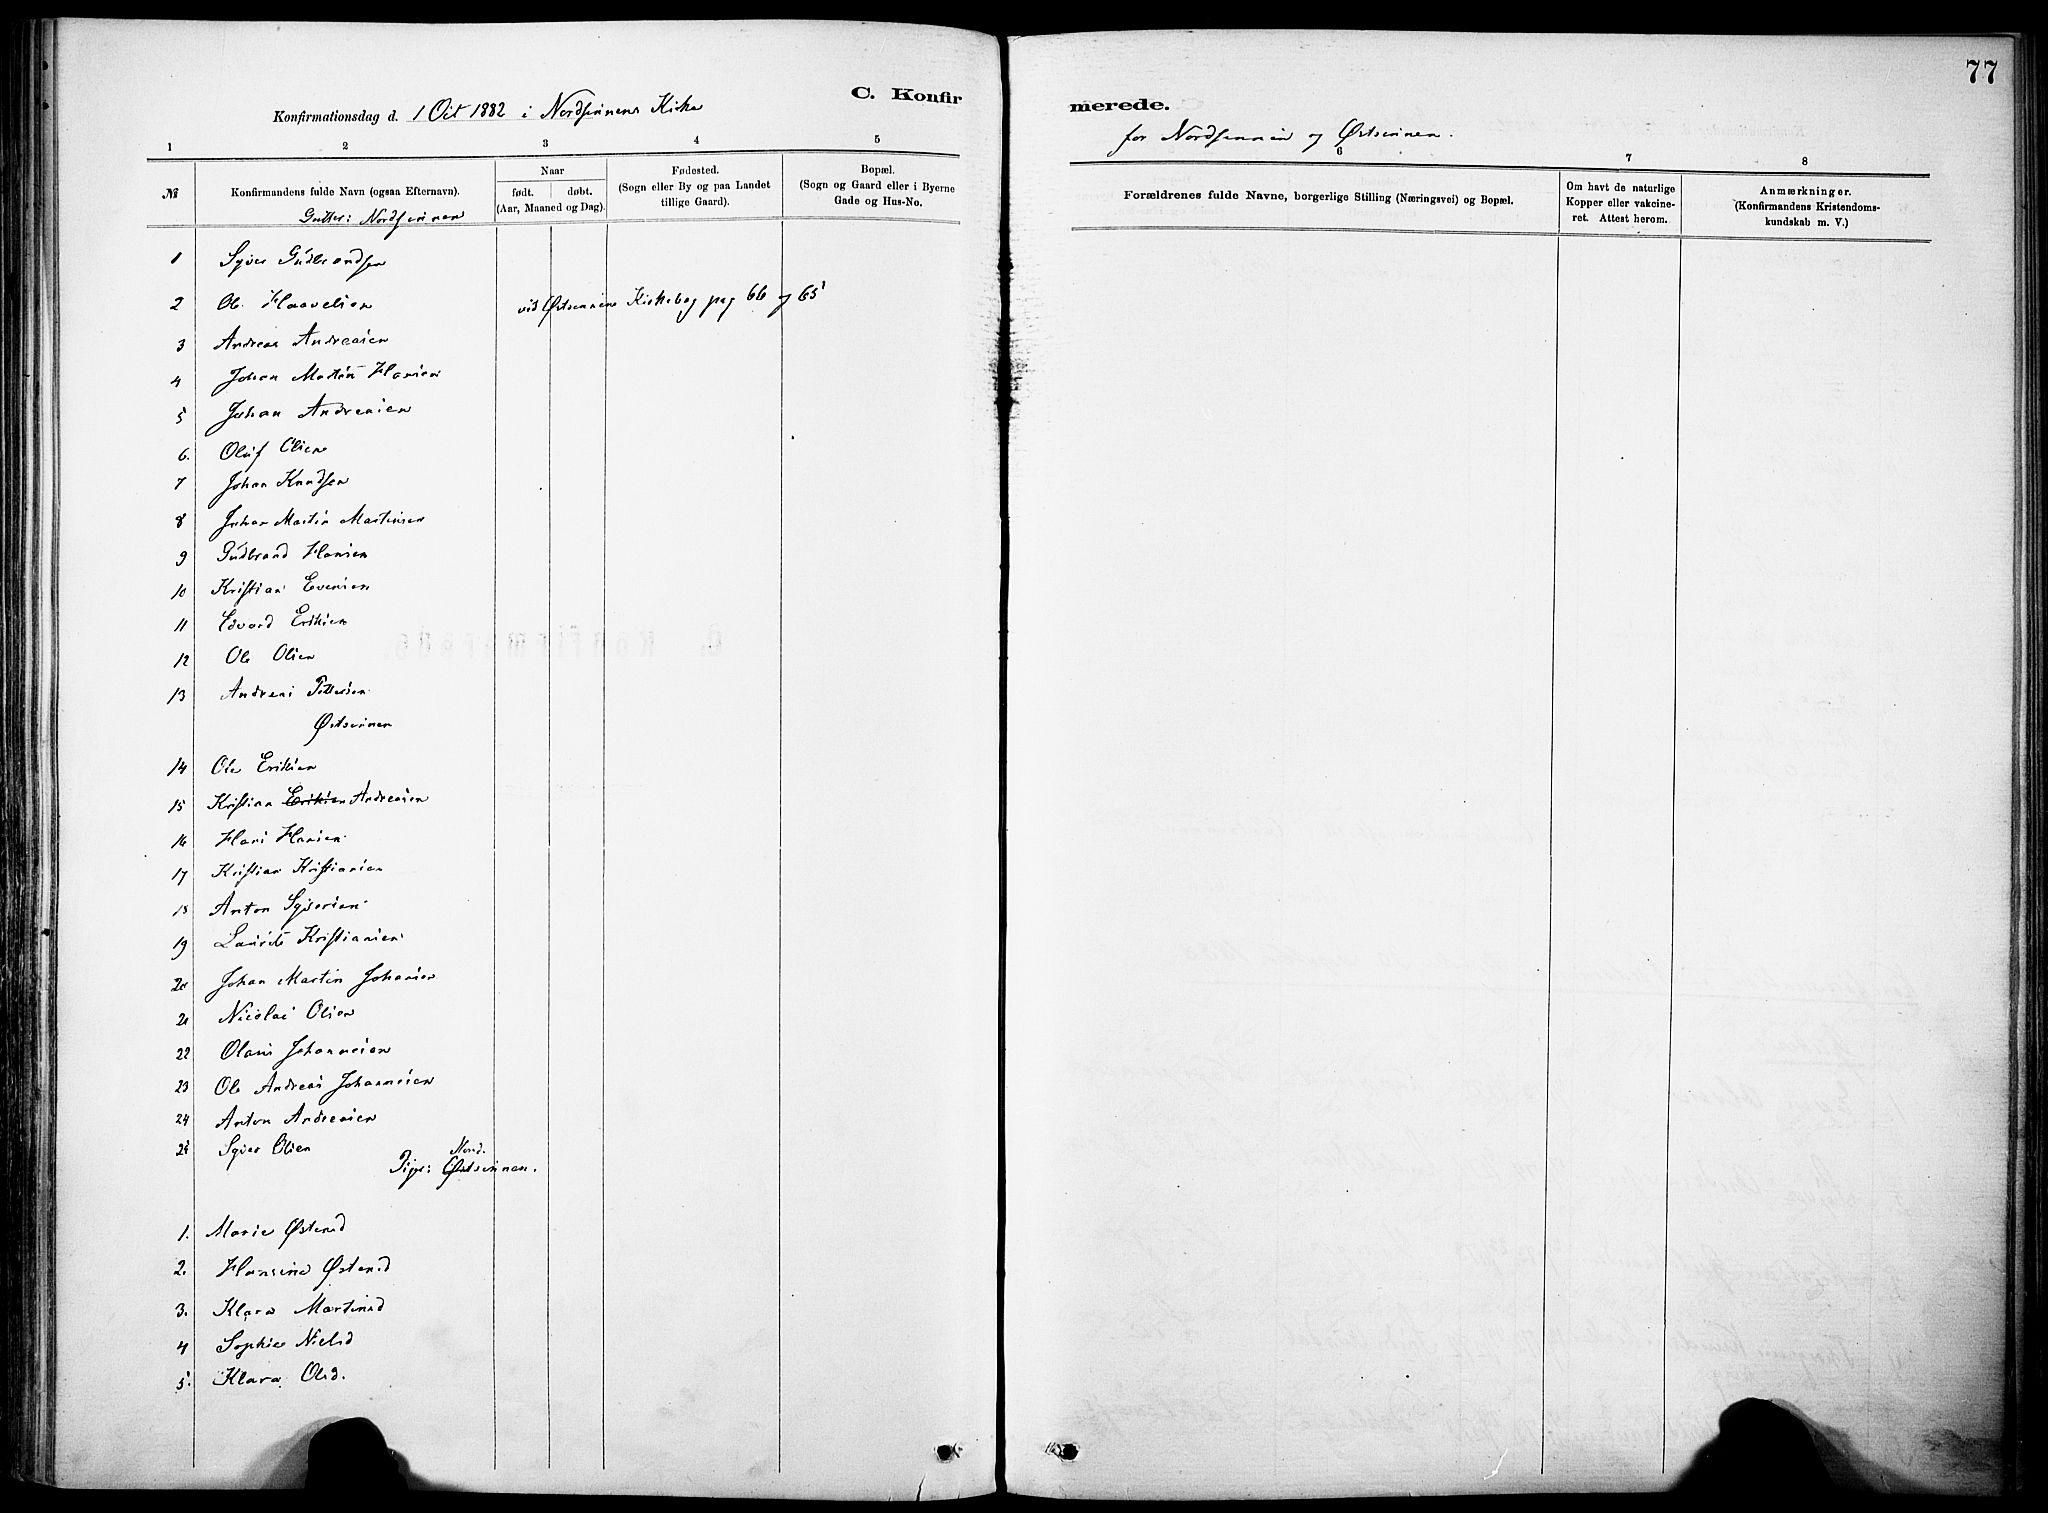 SAH, Nordre Land prestekontor, Ministerialbok nr. 5, 1882-1903, s. 77